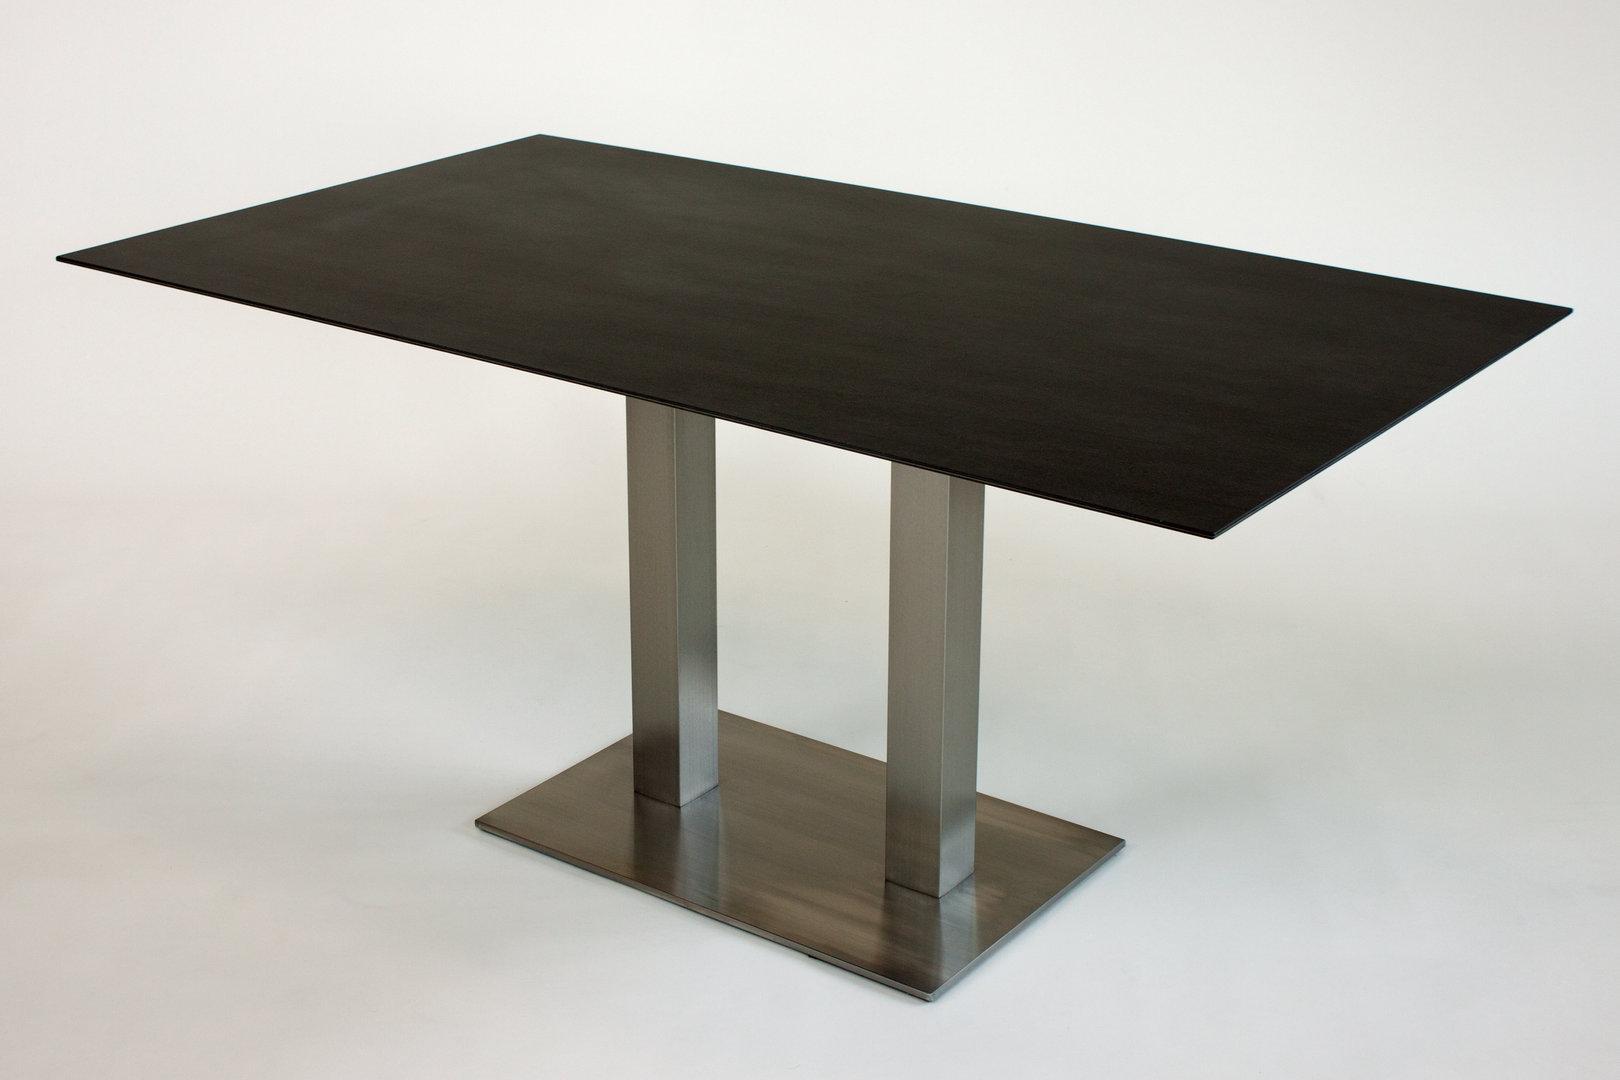 nevado keramik esstisch alpgranit. Black Bedroom Furniture Sets. Home Design Ideas